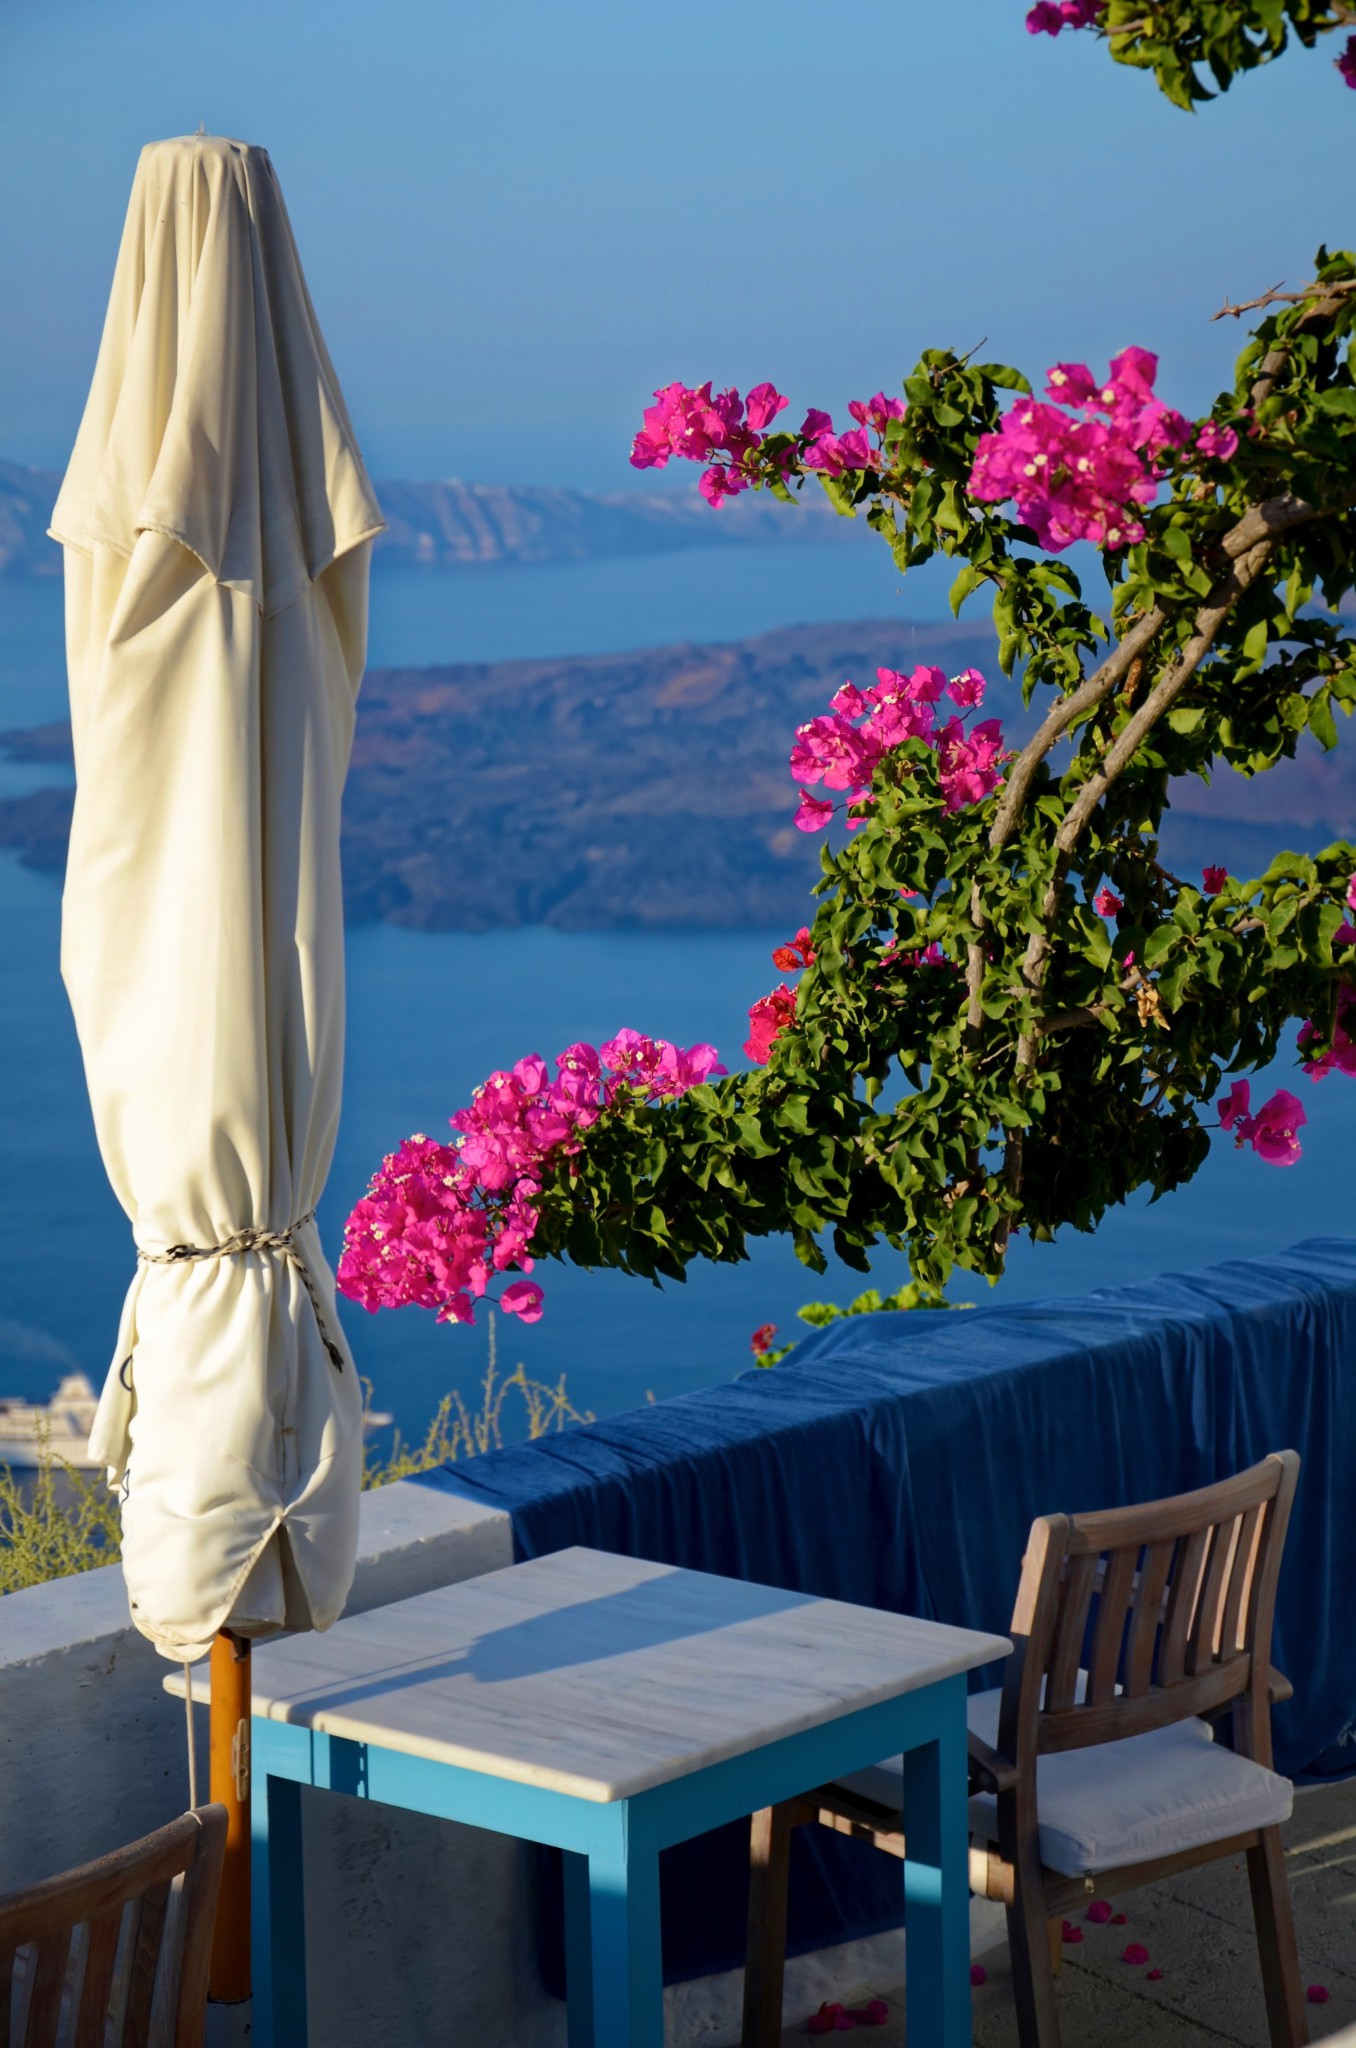 Idylle auf dem Balkon - Imerovigli - Santorin